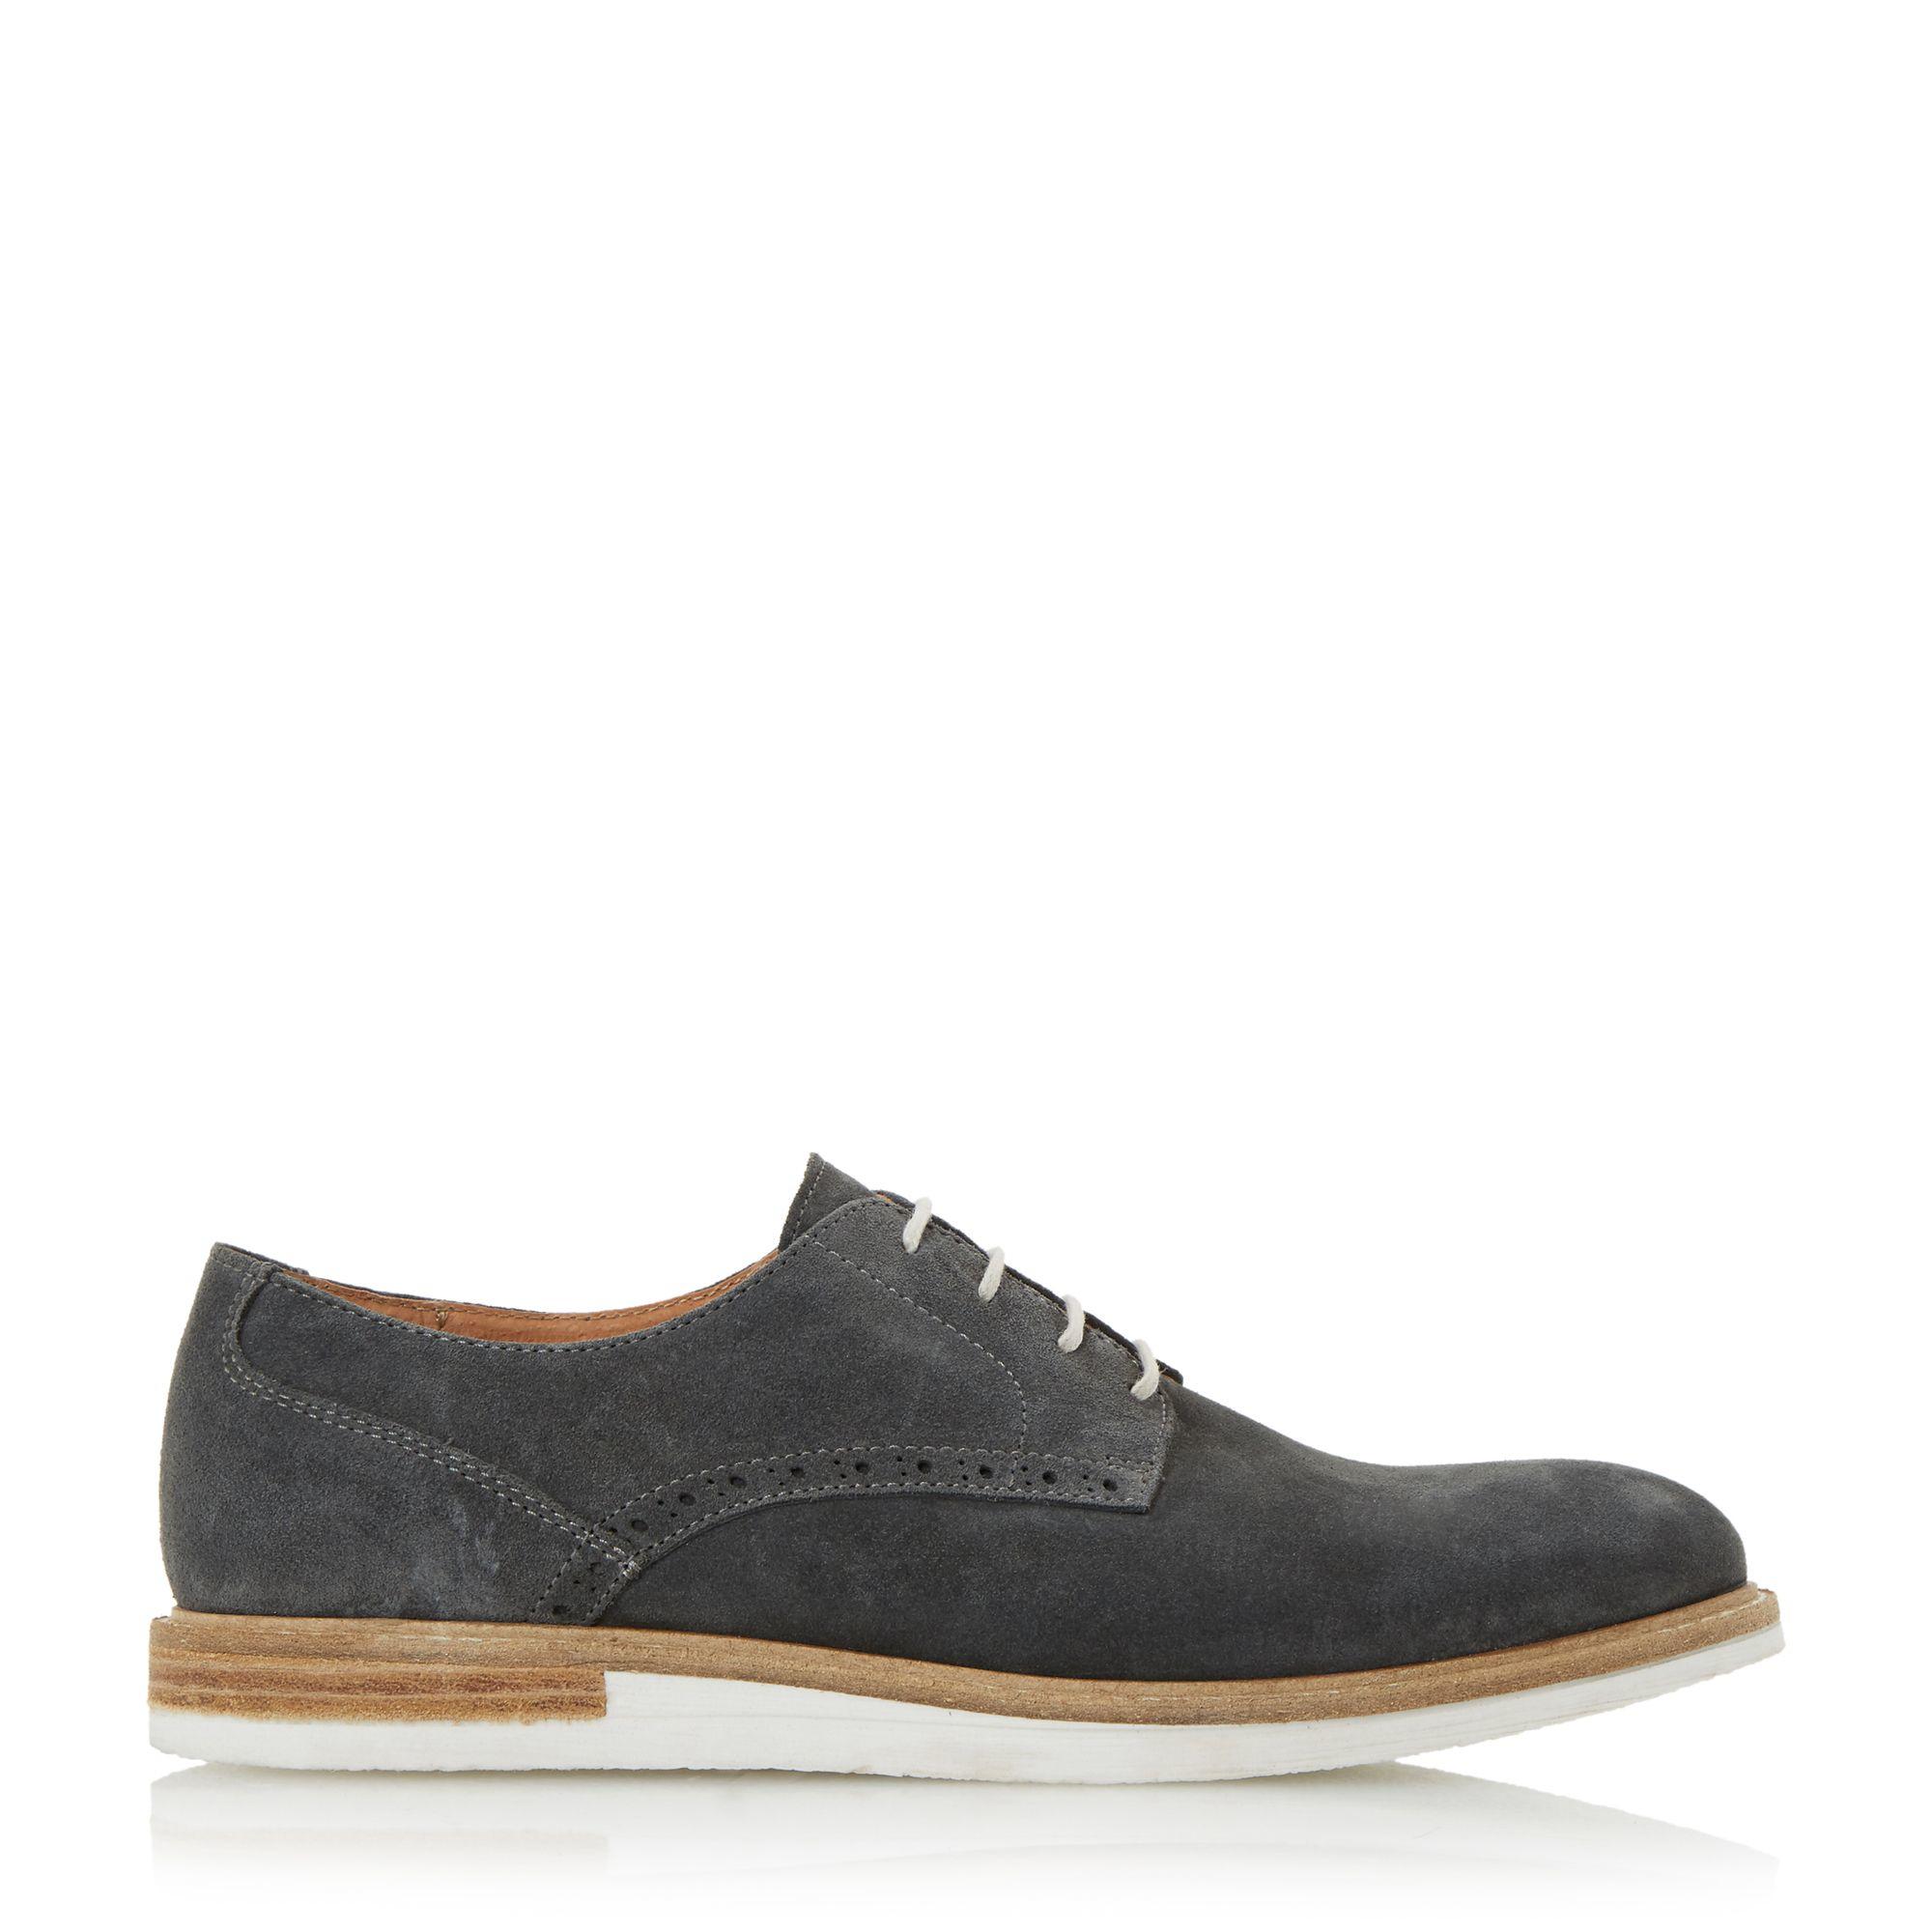 Dune Suede Boxpark Venerr Wedge Gibson Shoes in Grey (Grey) for Men